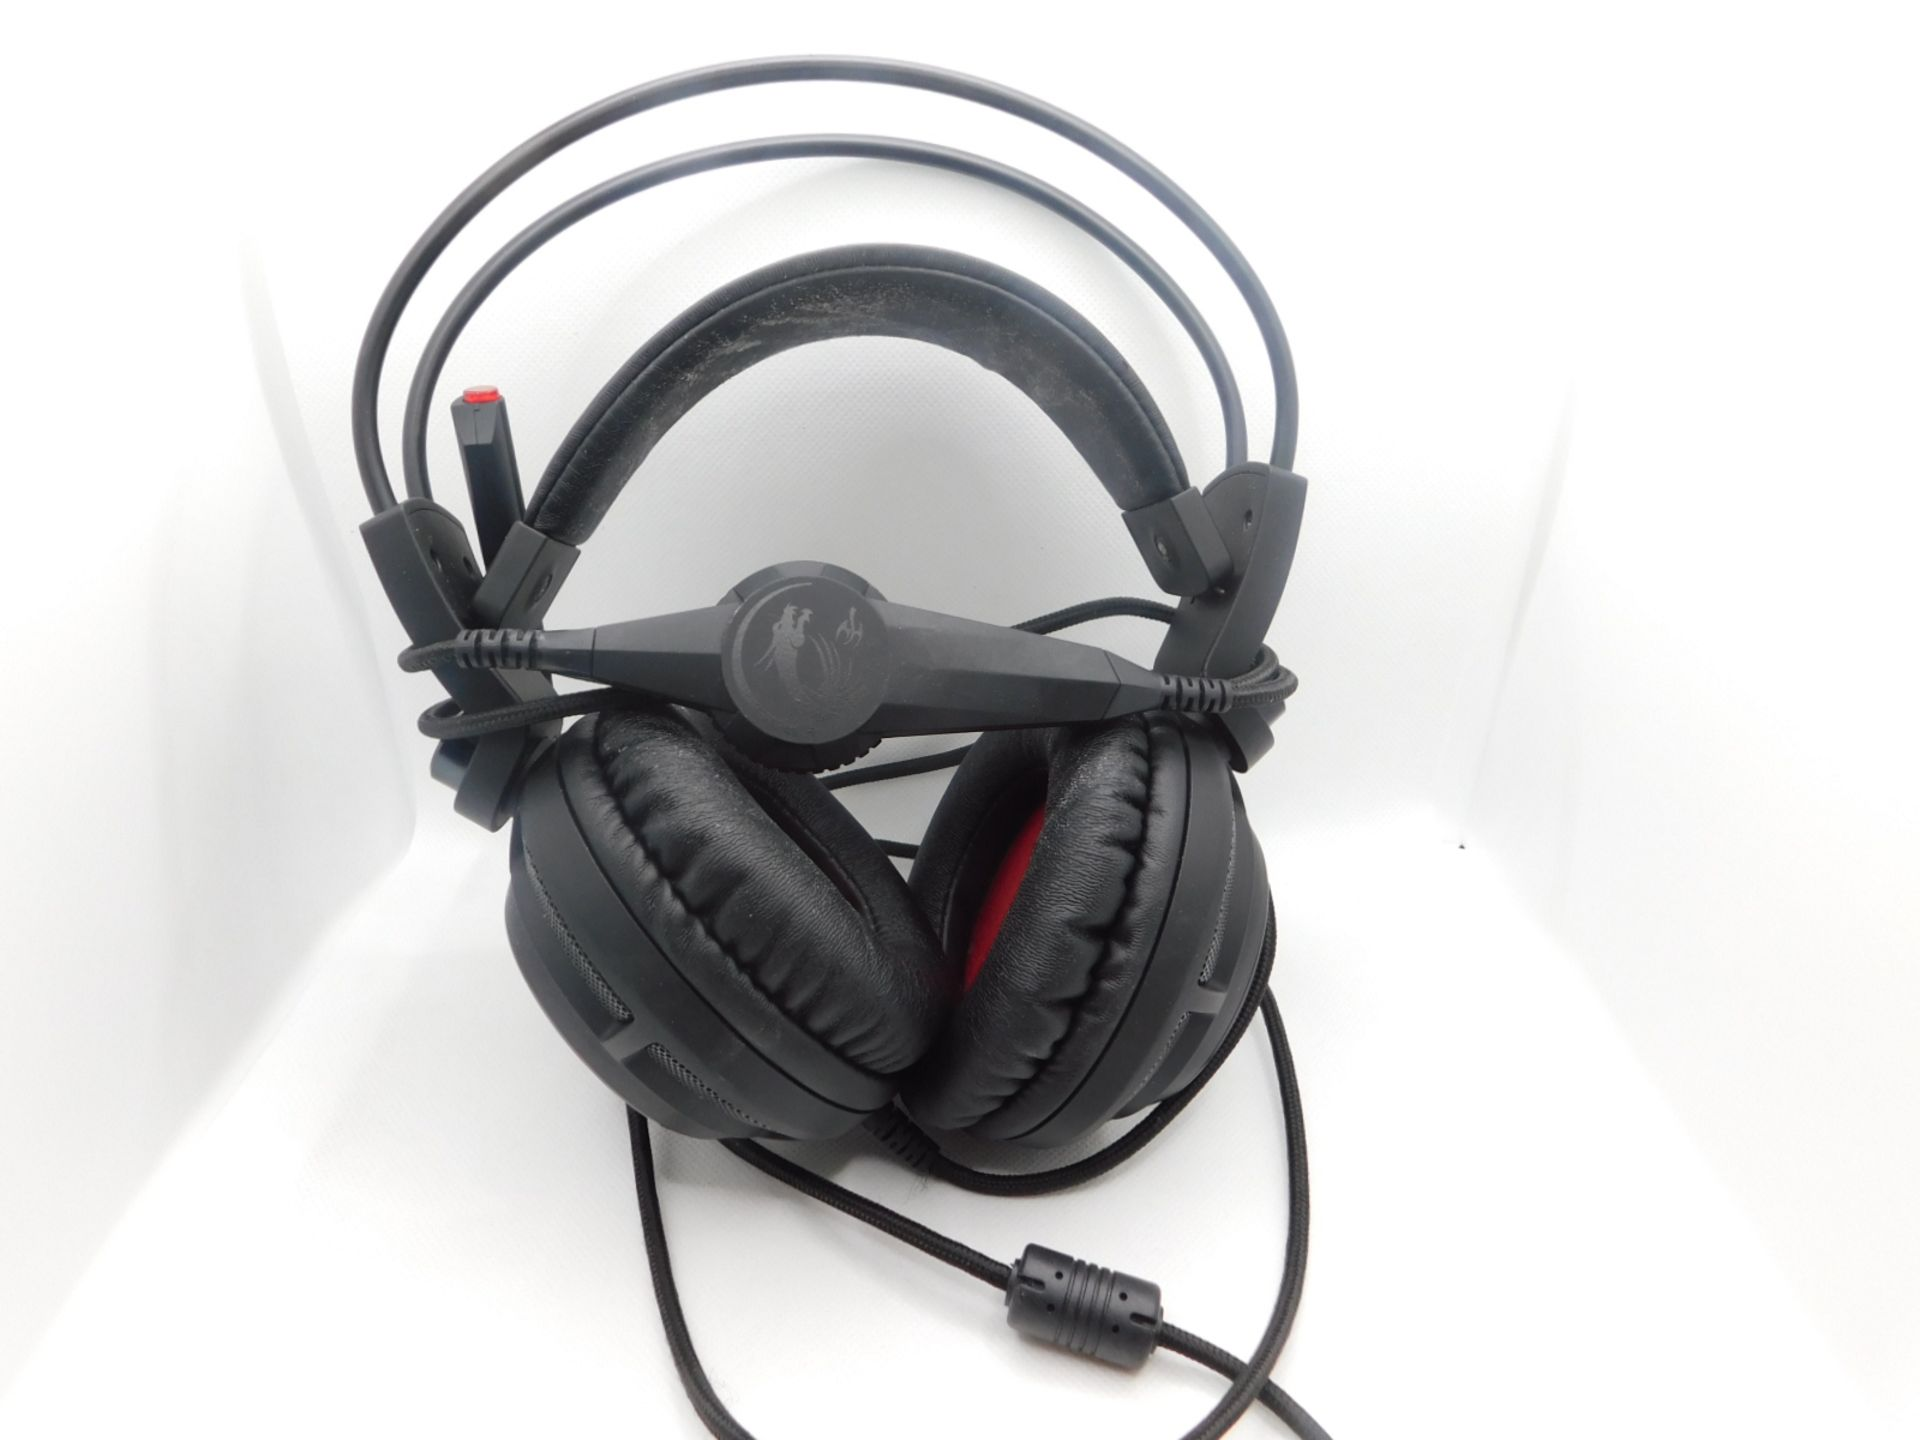 1 MSI DS502 TRUE GAMING HEADSET RRP £64.99